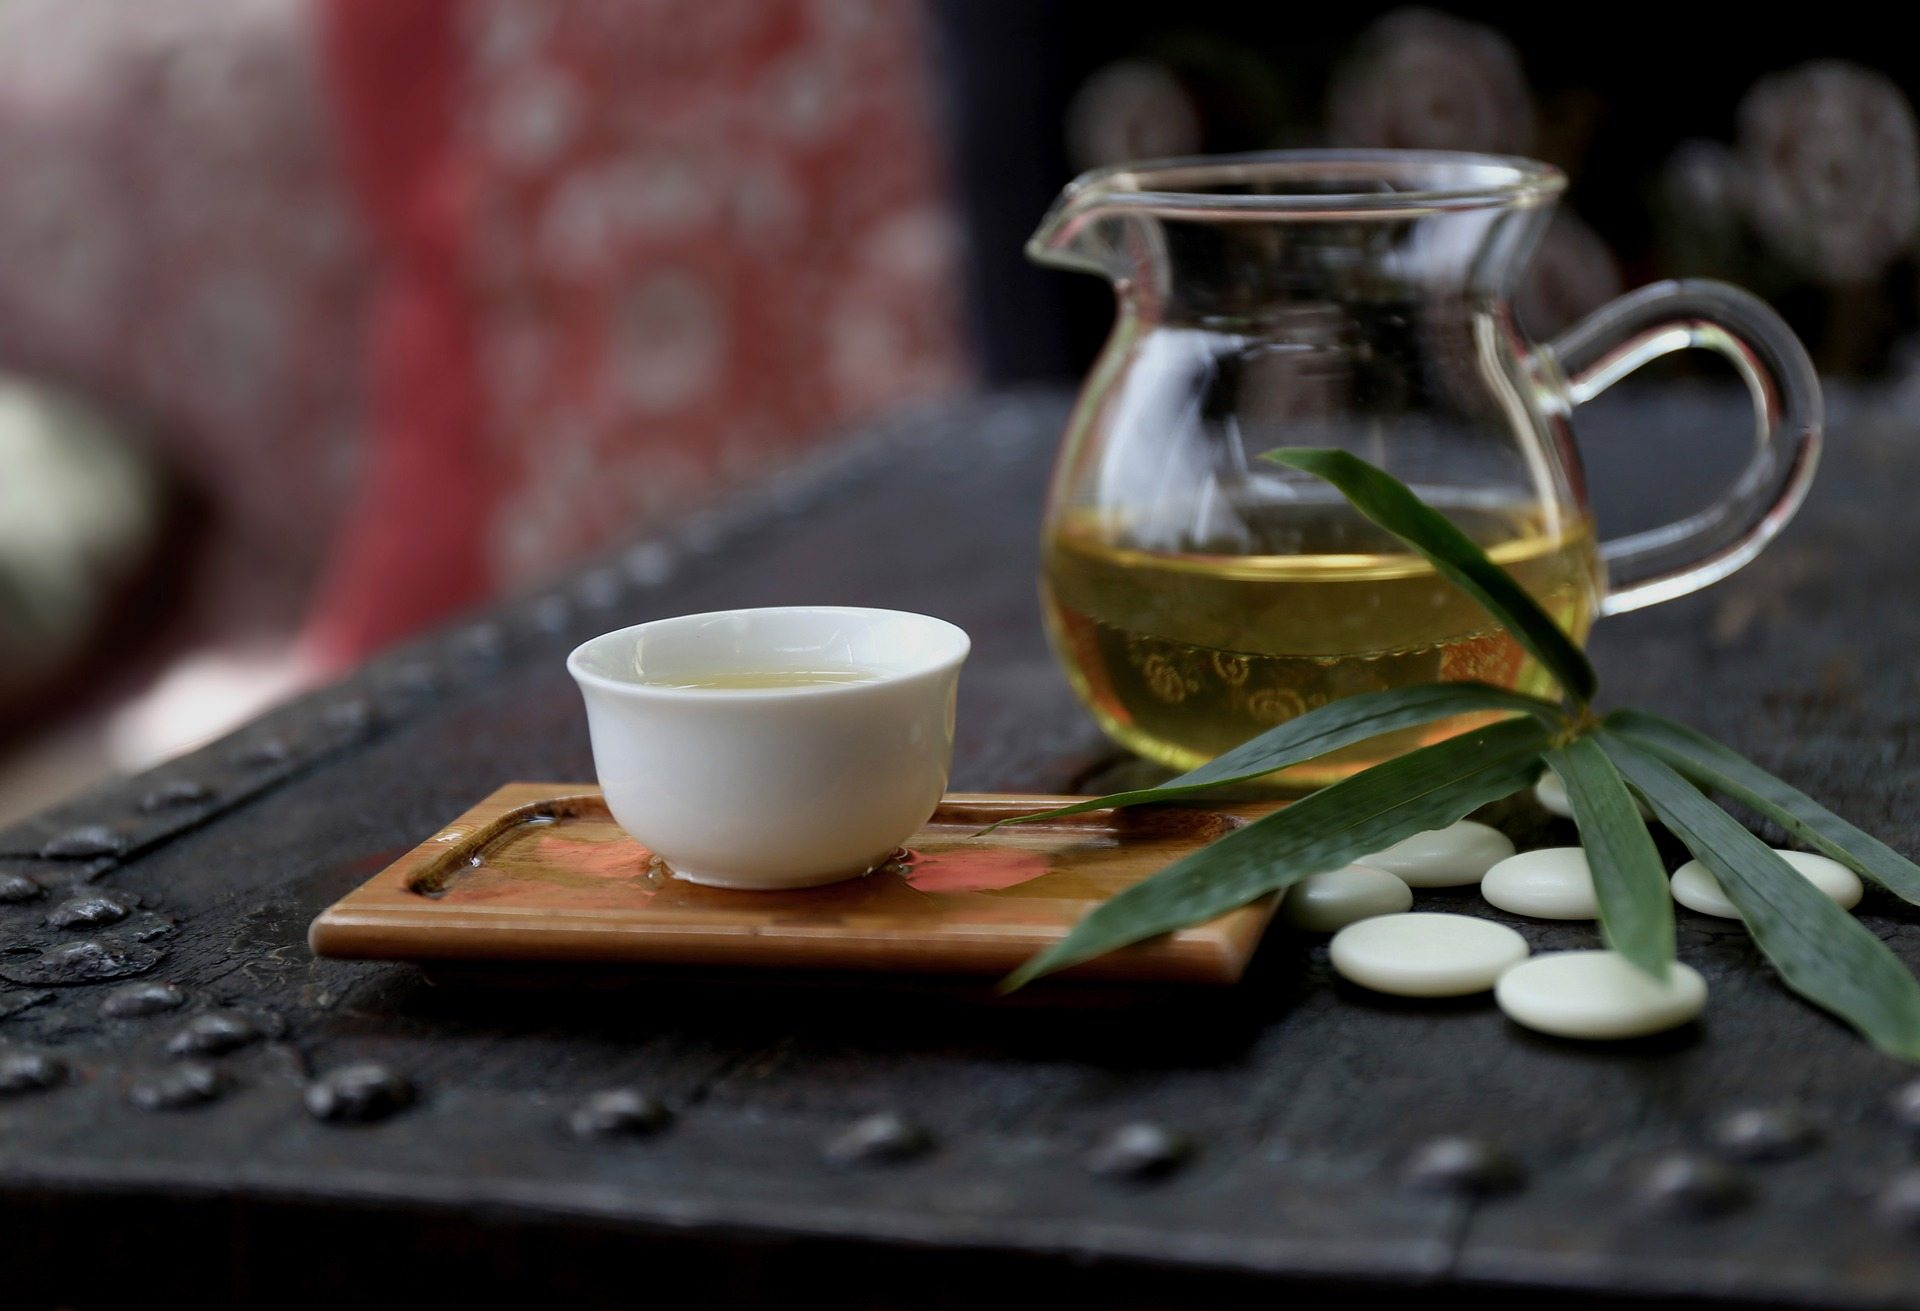 Tea Wholesale Suppliers: Digestive Tea Options